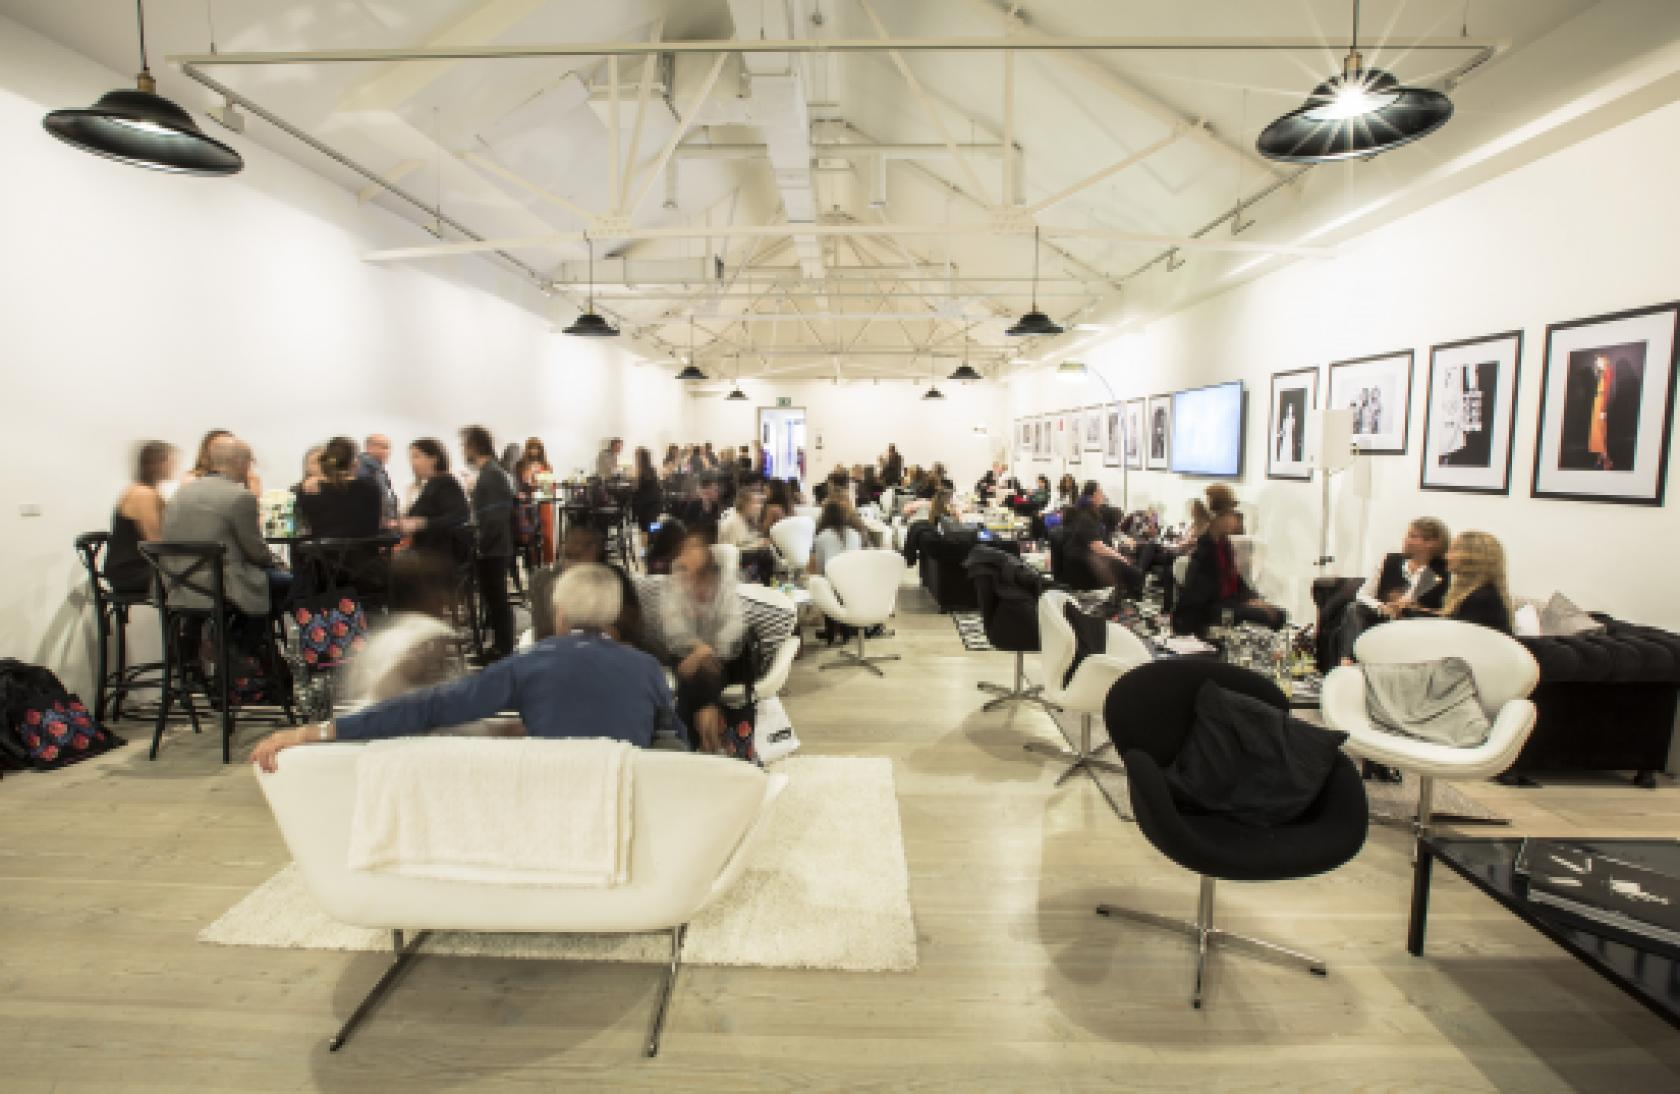 Saatchi Gallery Hire This Venue Best Prices Tagvenue